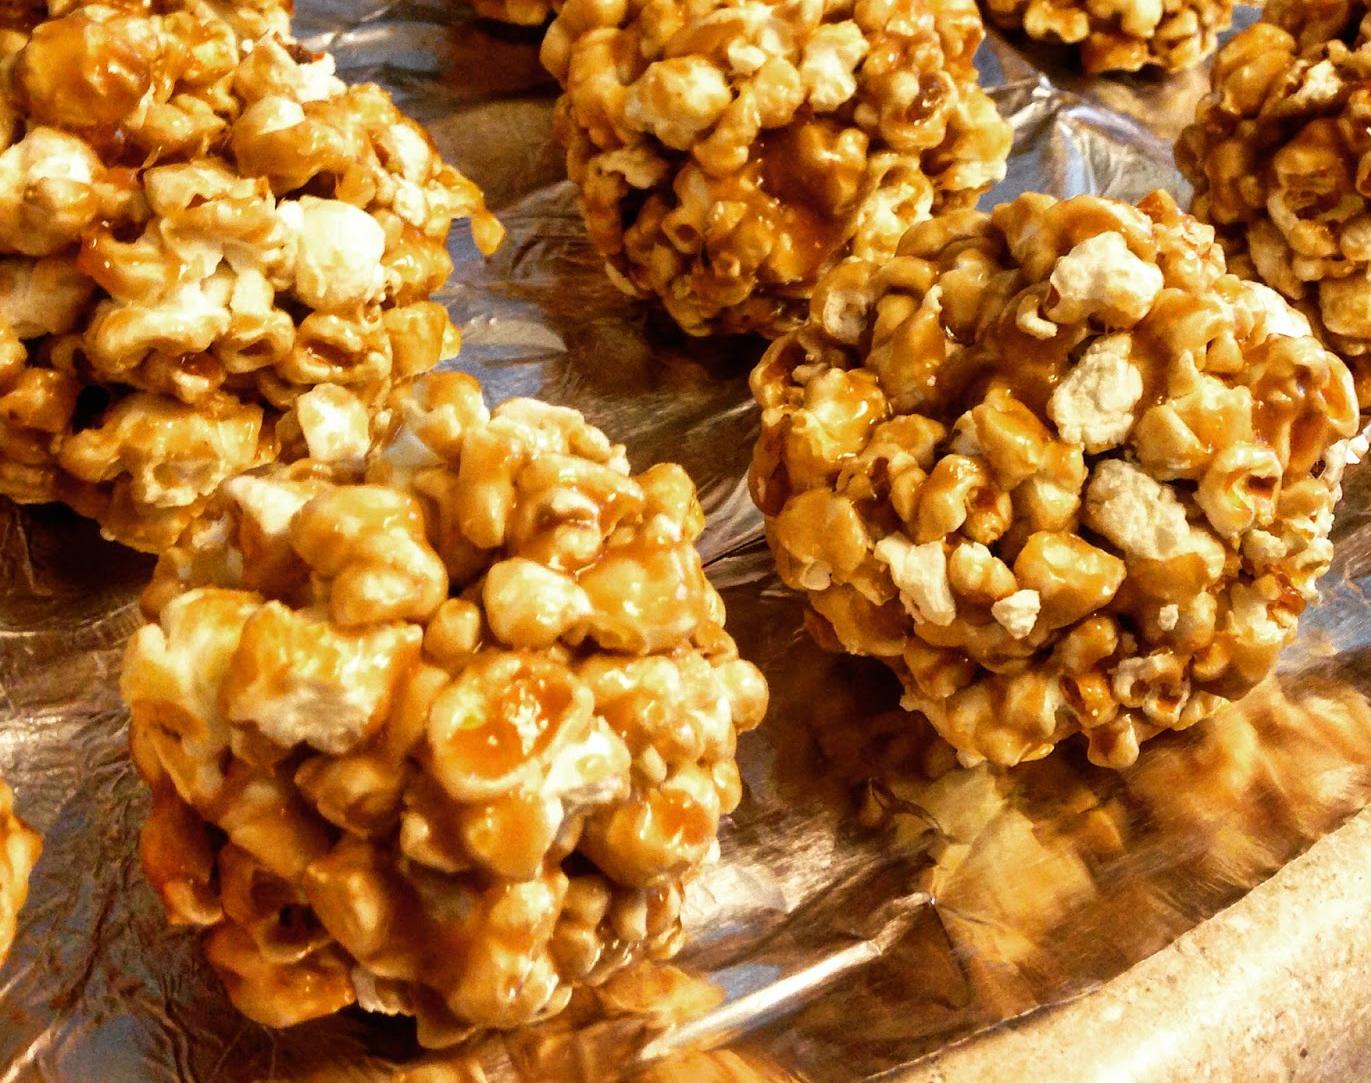 caramel-popcorn-ball-after